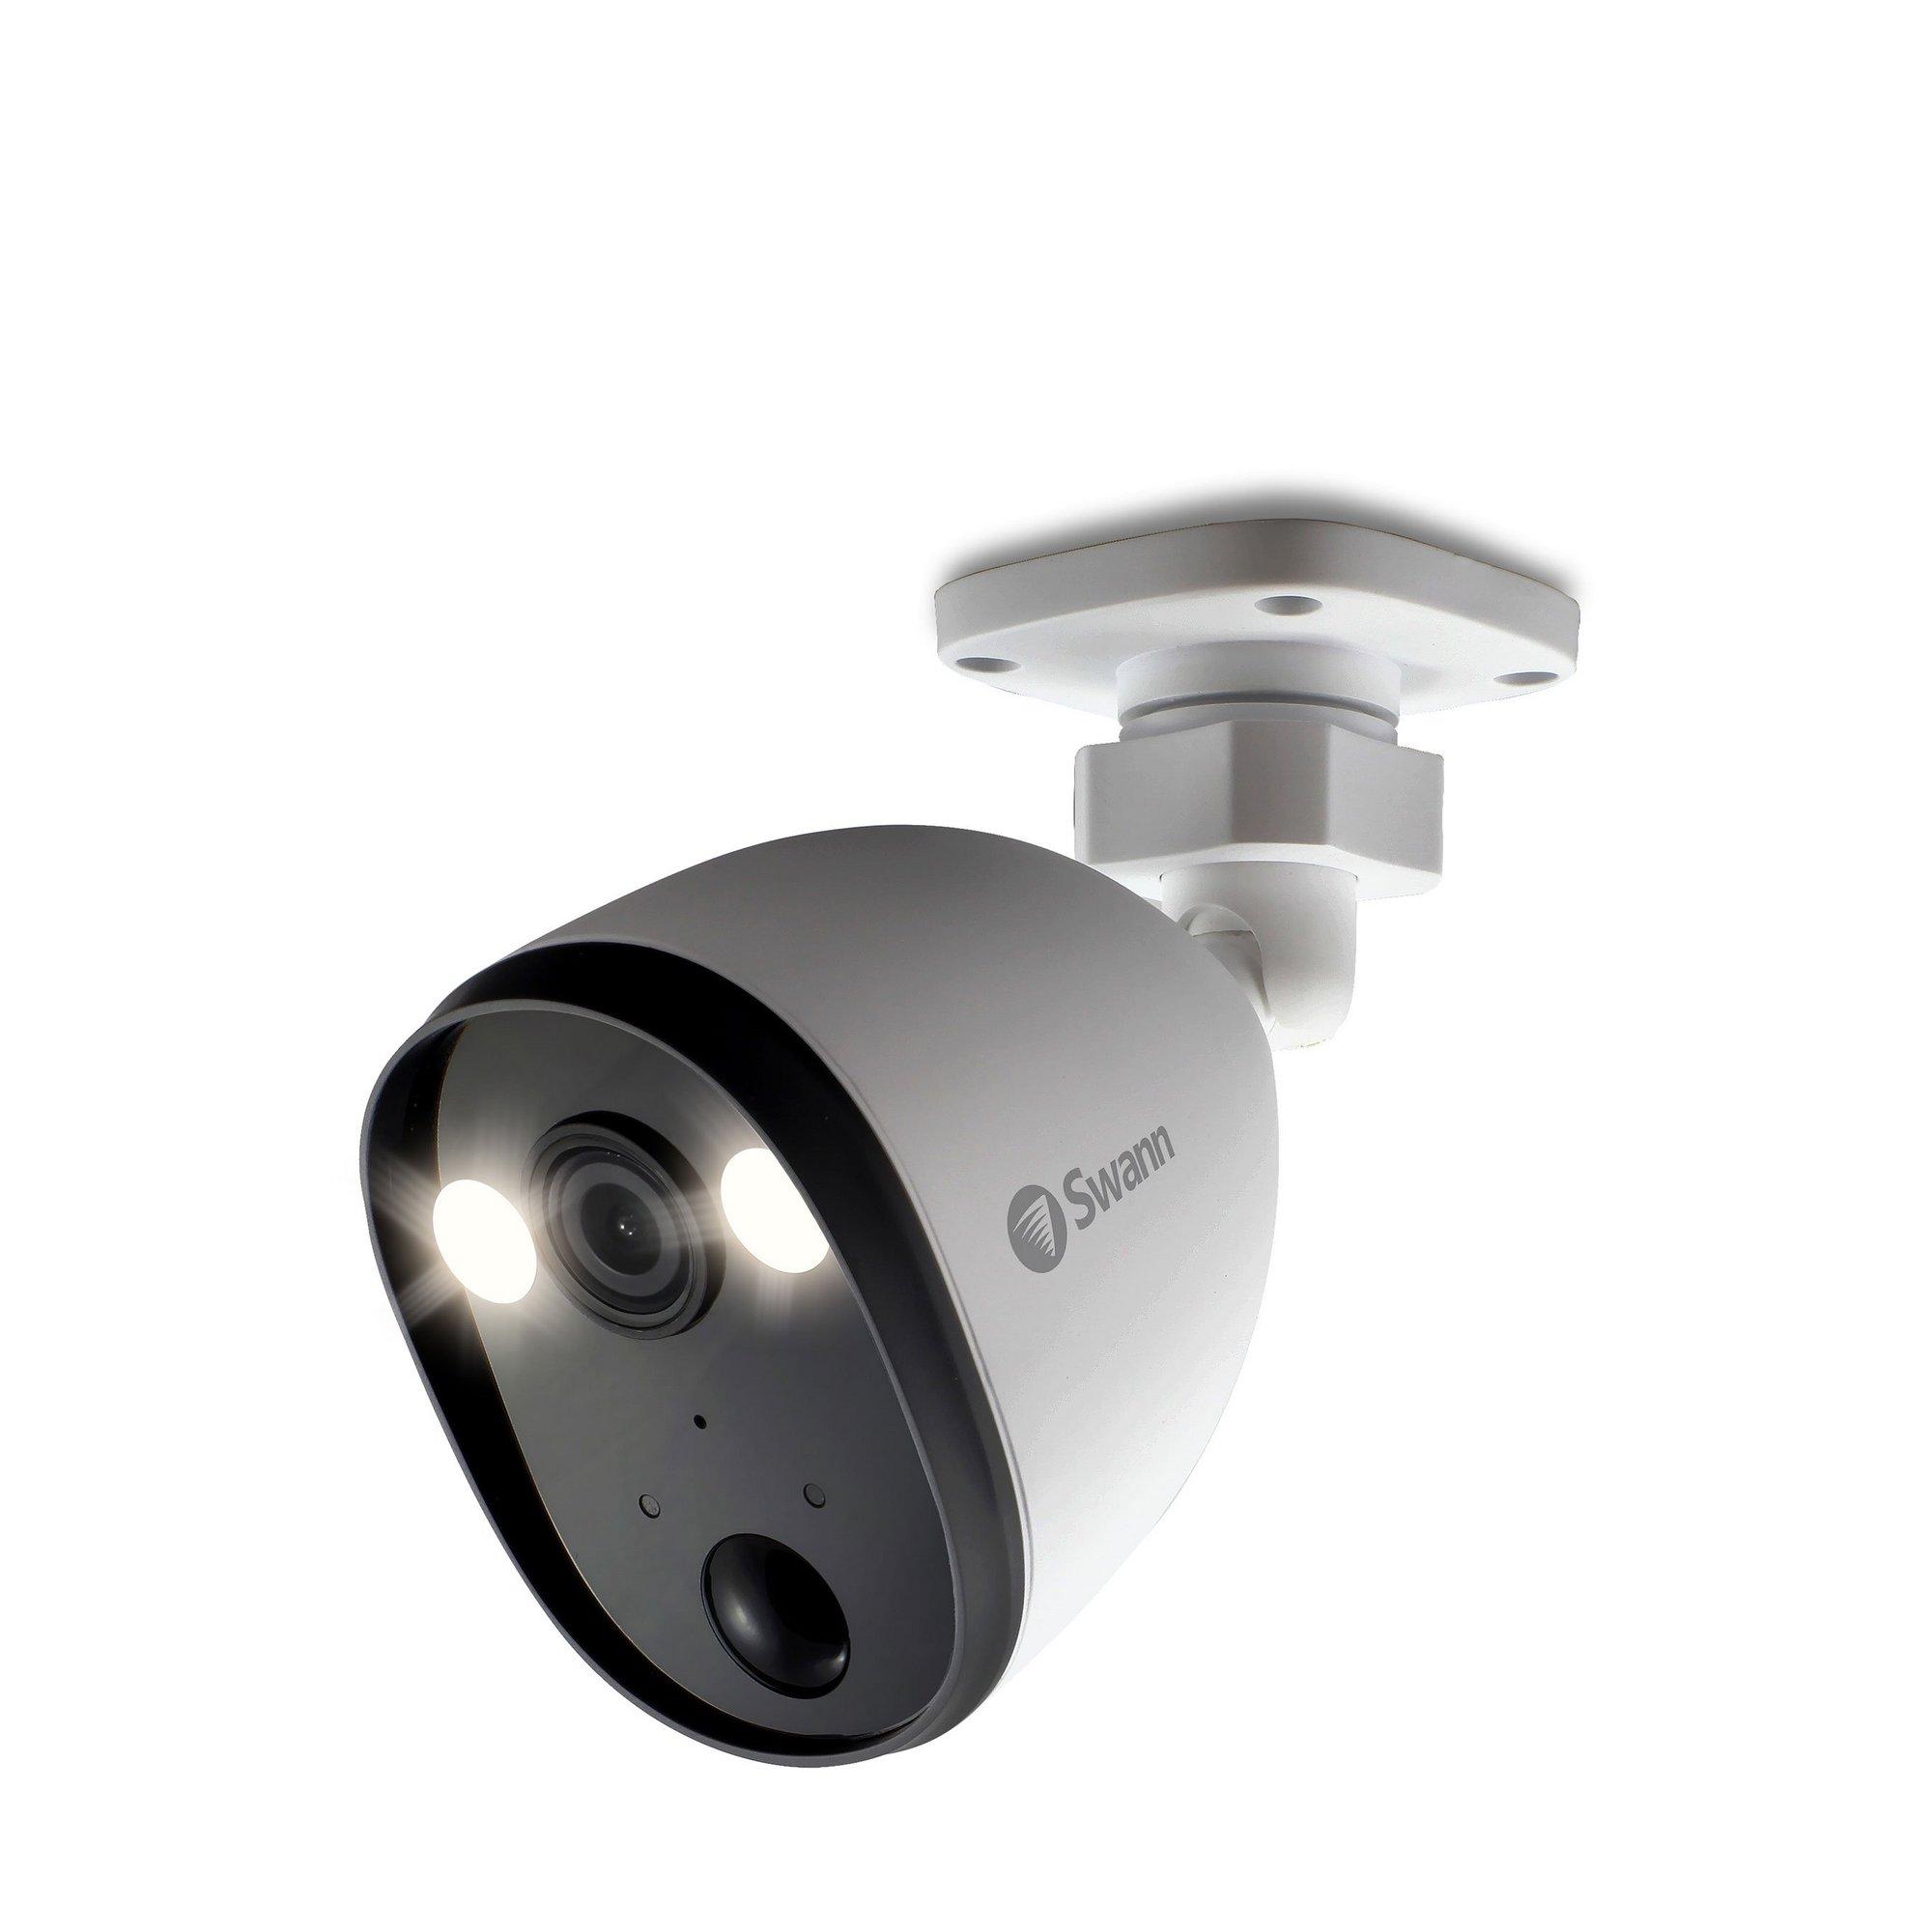 Image of Swann 1080p Full HD Spotlight Outdoor Security Camera